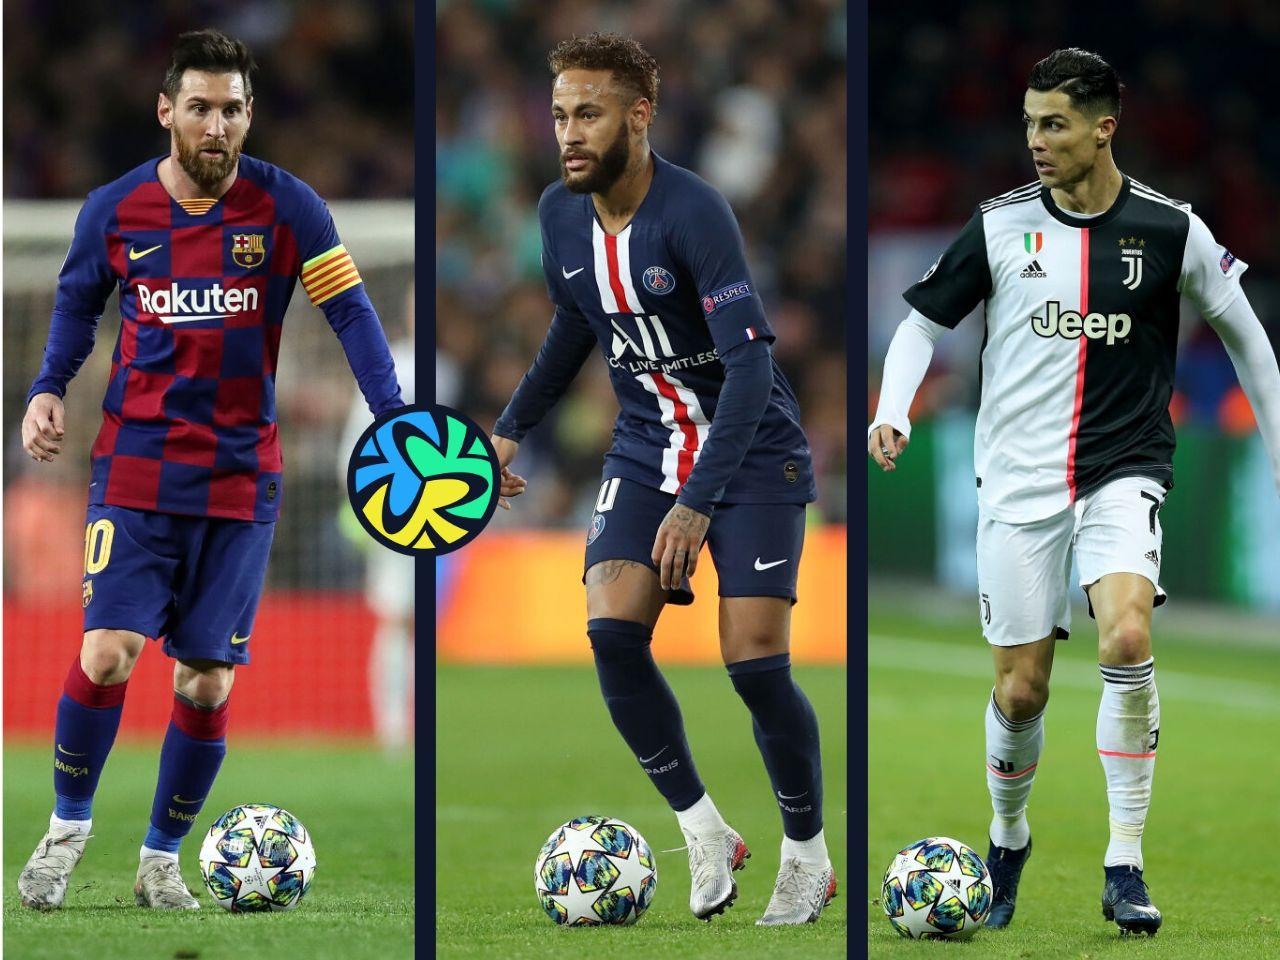 Champions League, Top 5